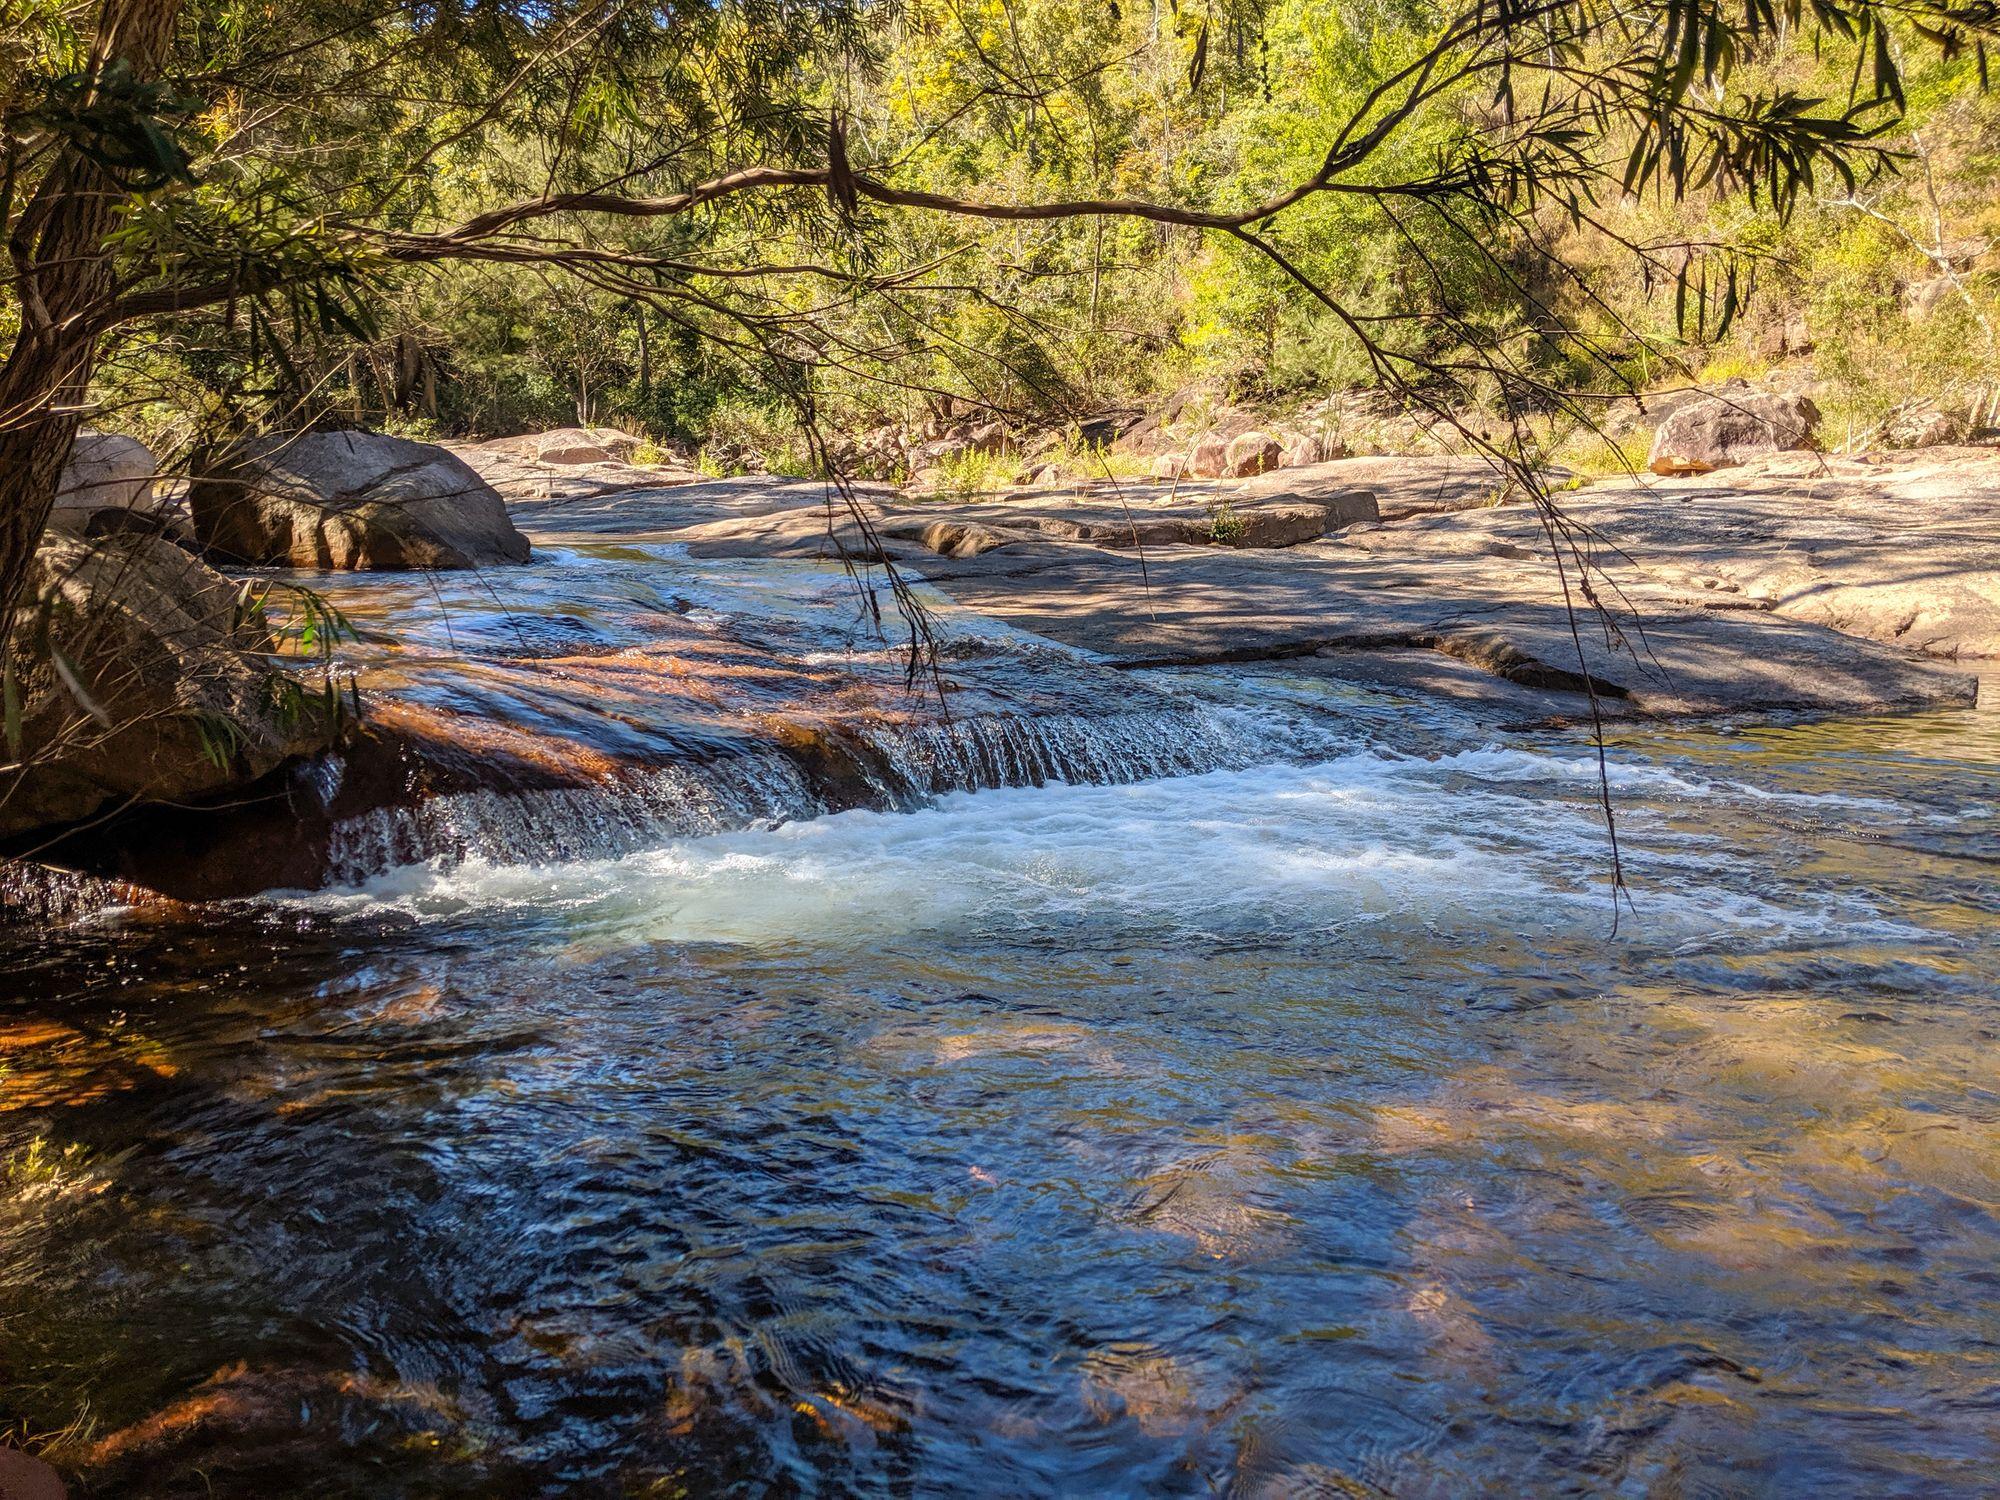 small rapids major creek